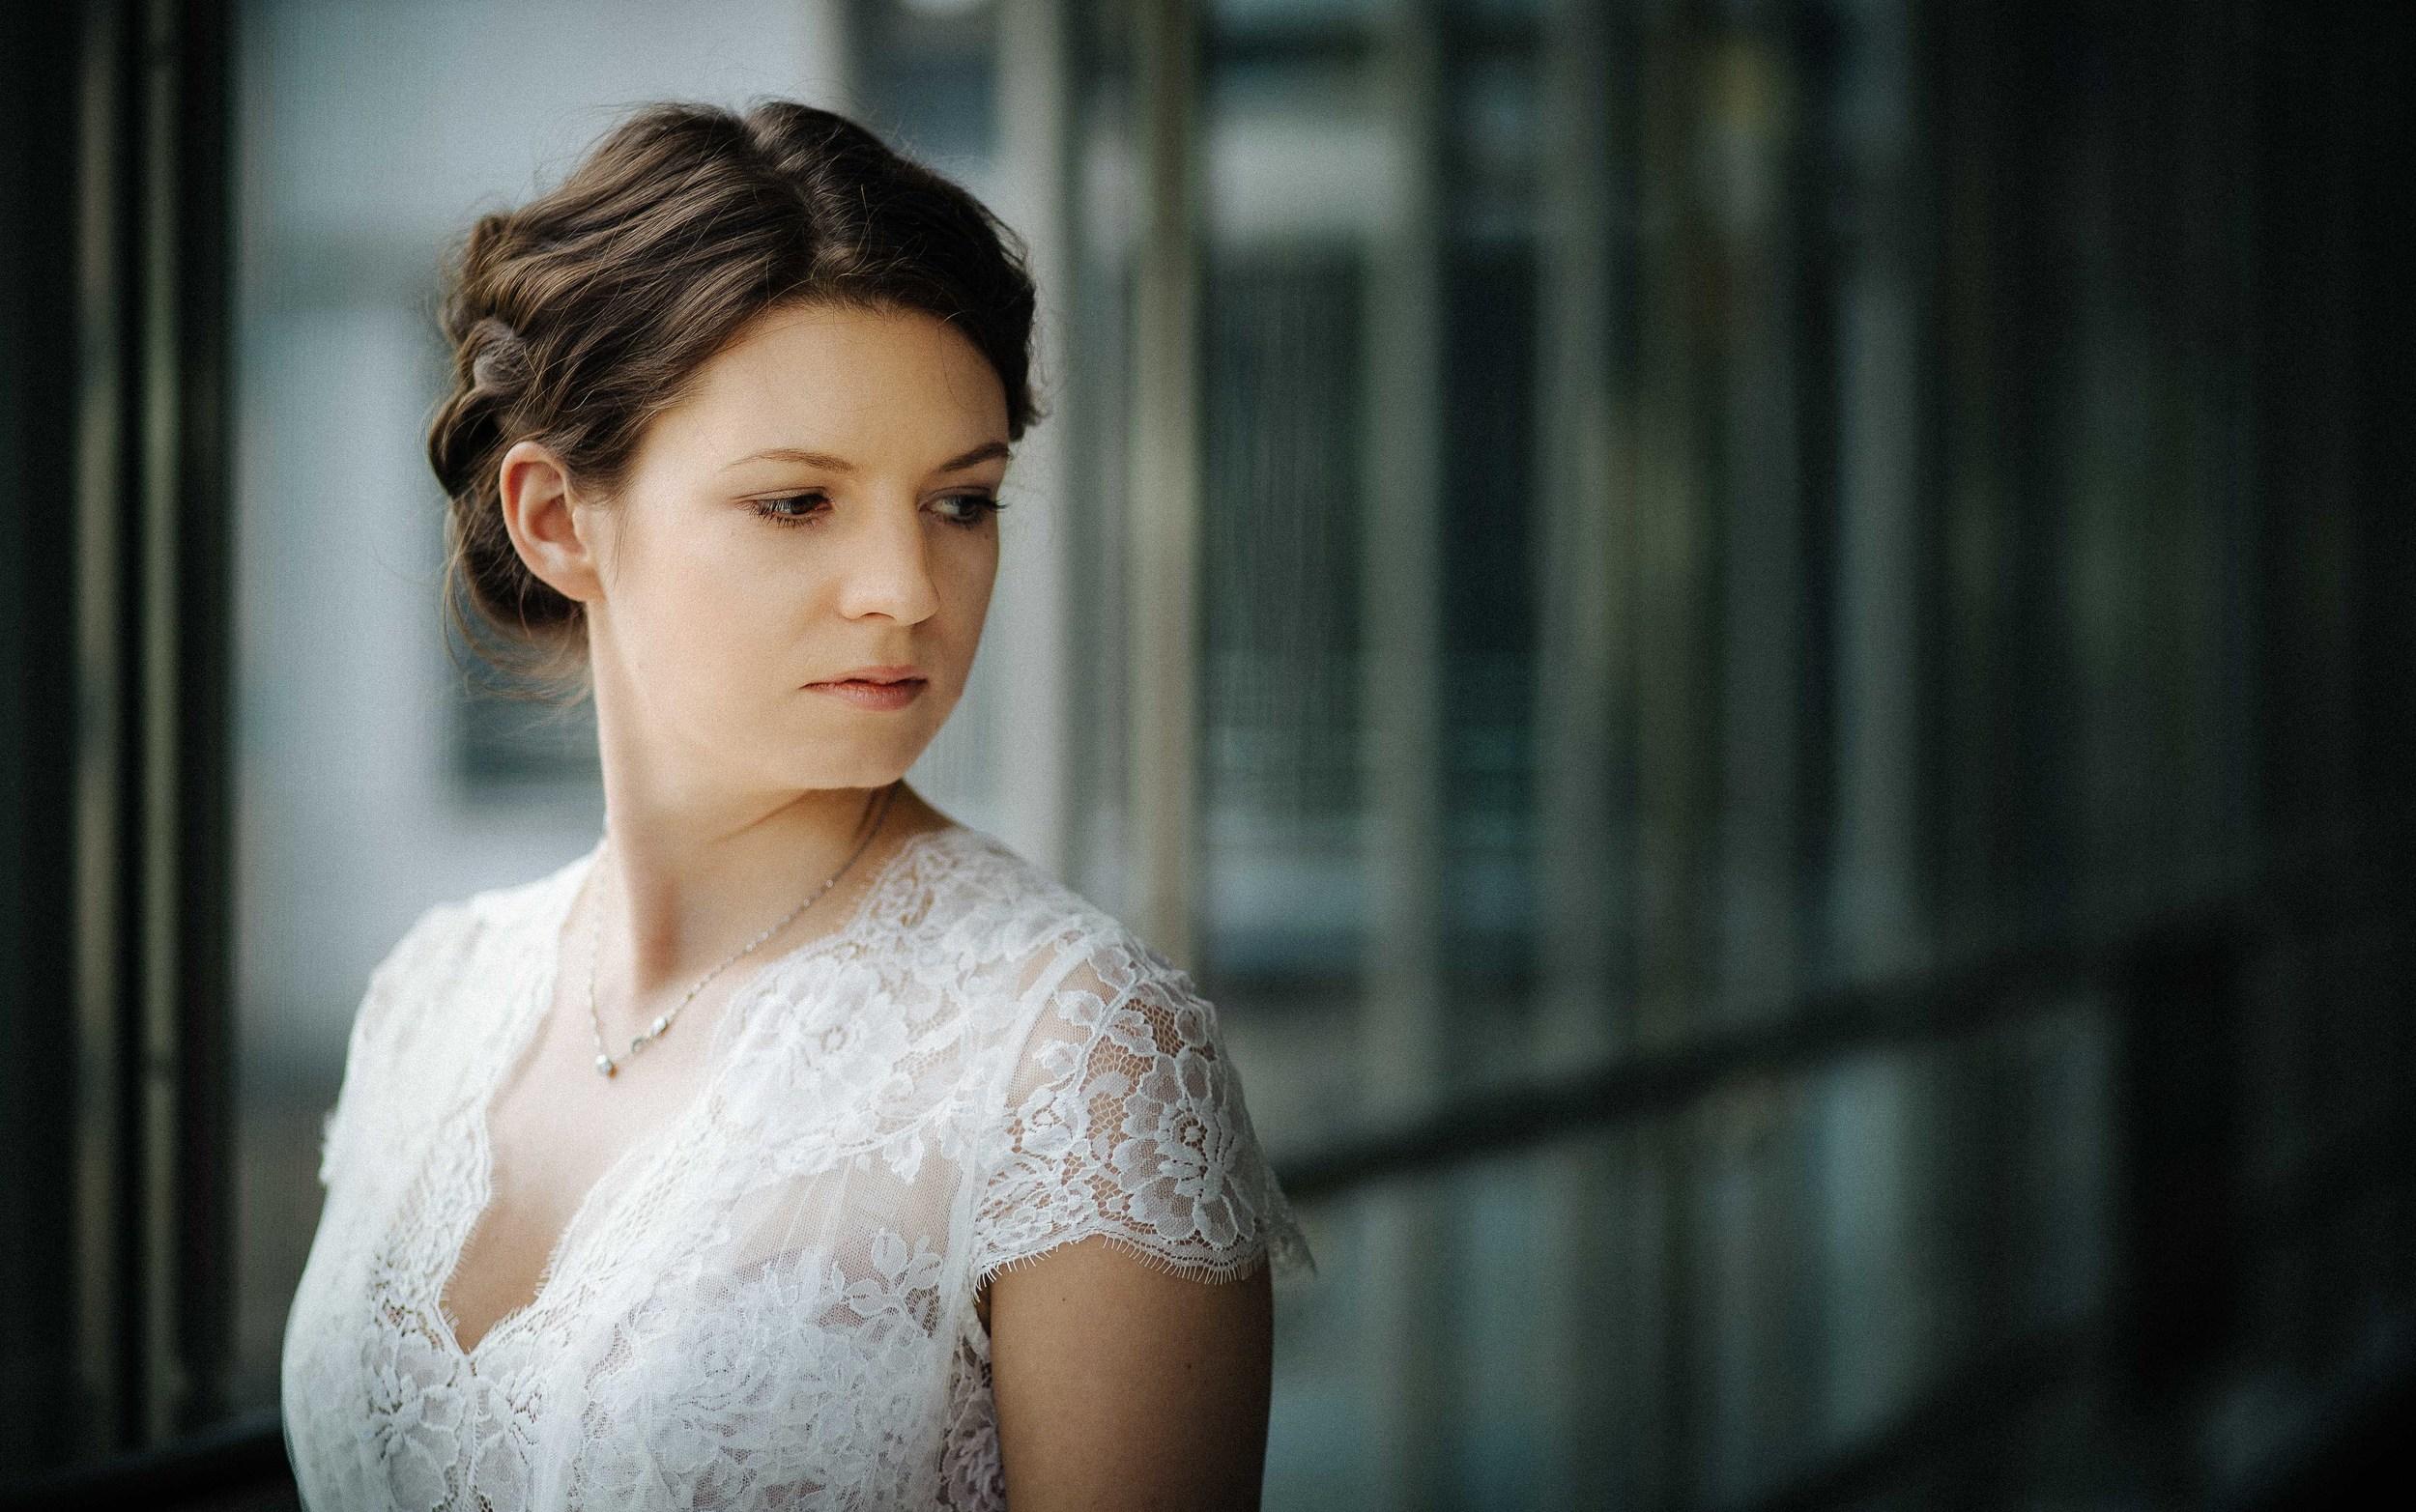 russian-bride-2-london-uk-destination-wedding-photography-Adam-Rowley